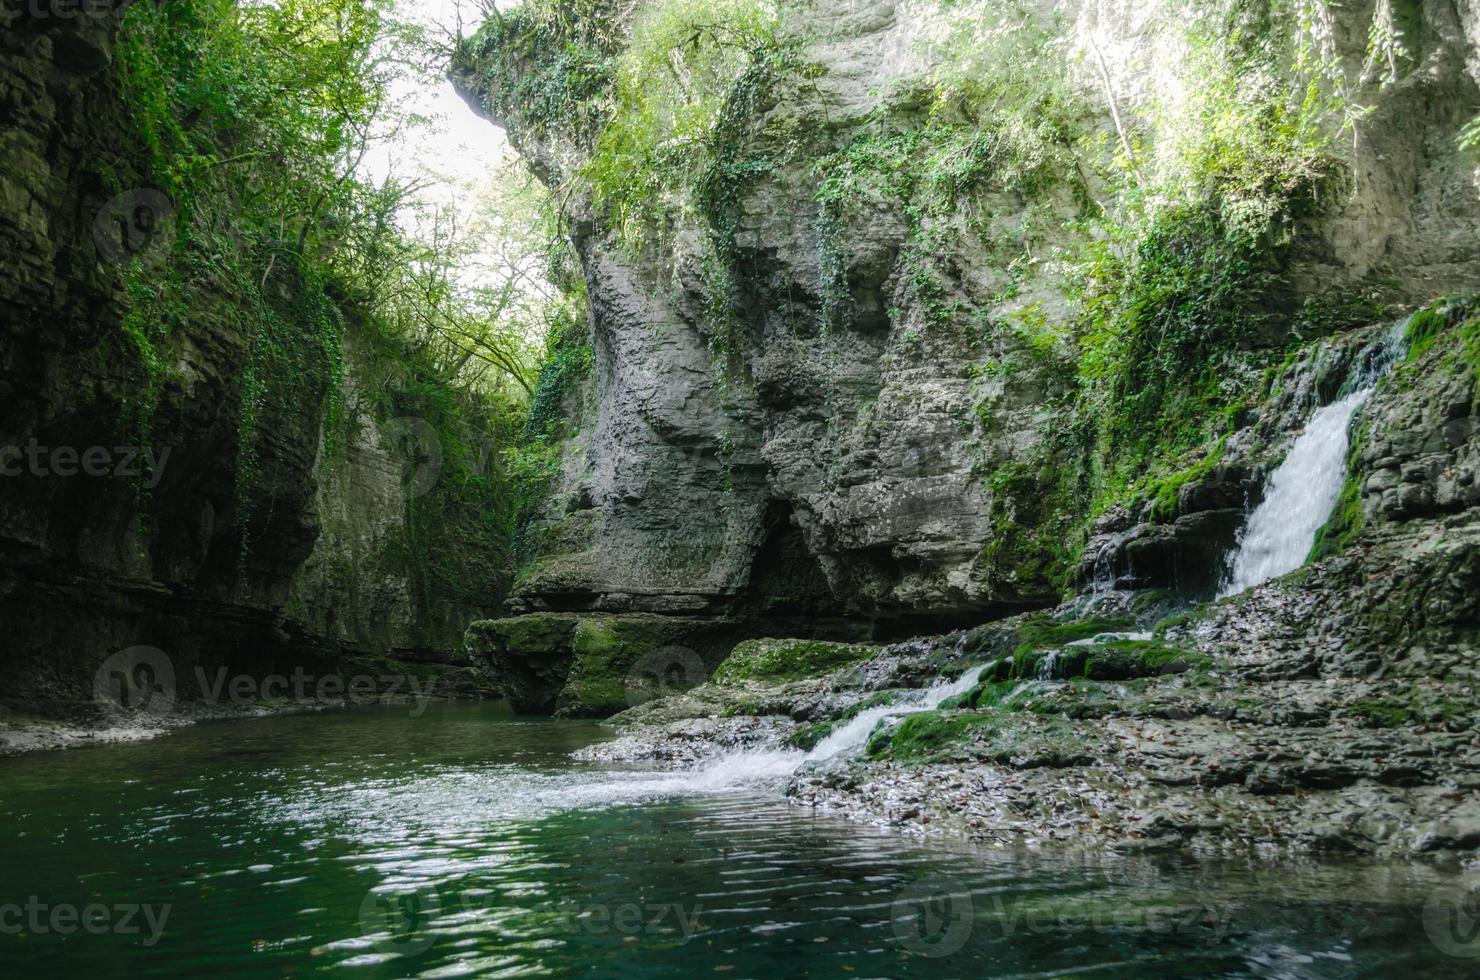 litet vattenfall i en skog foto